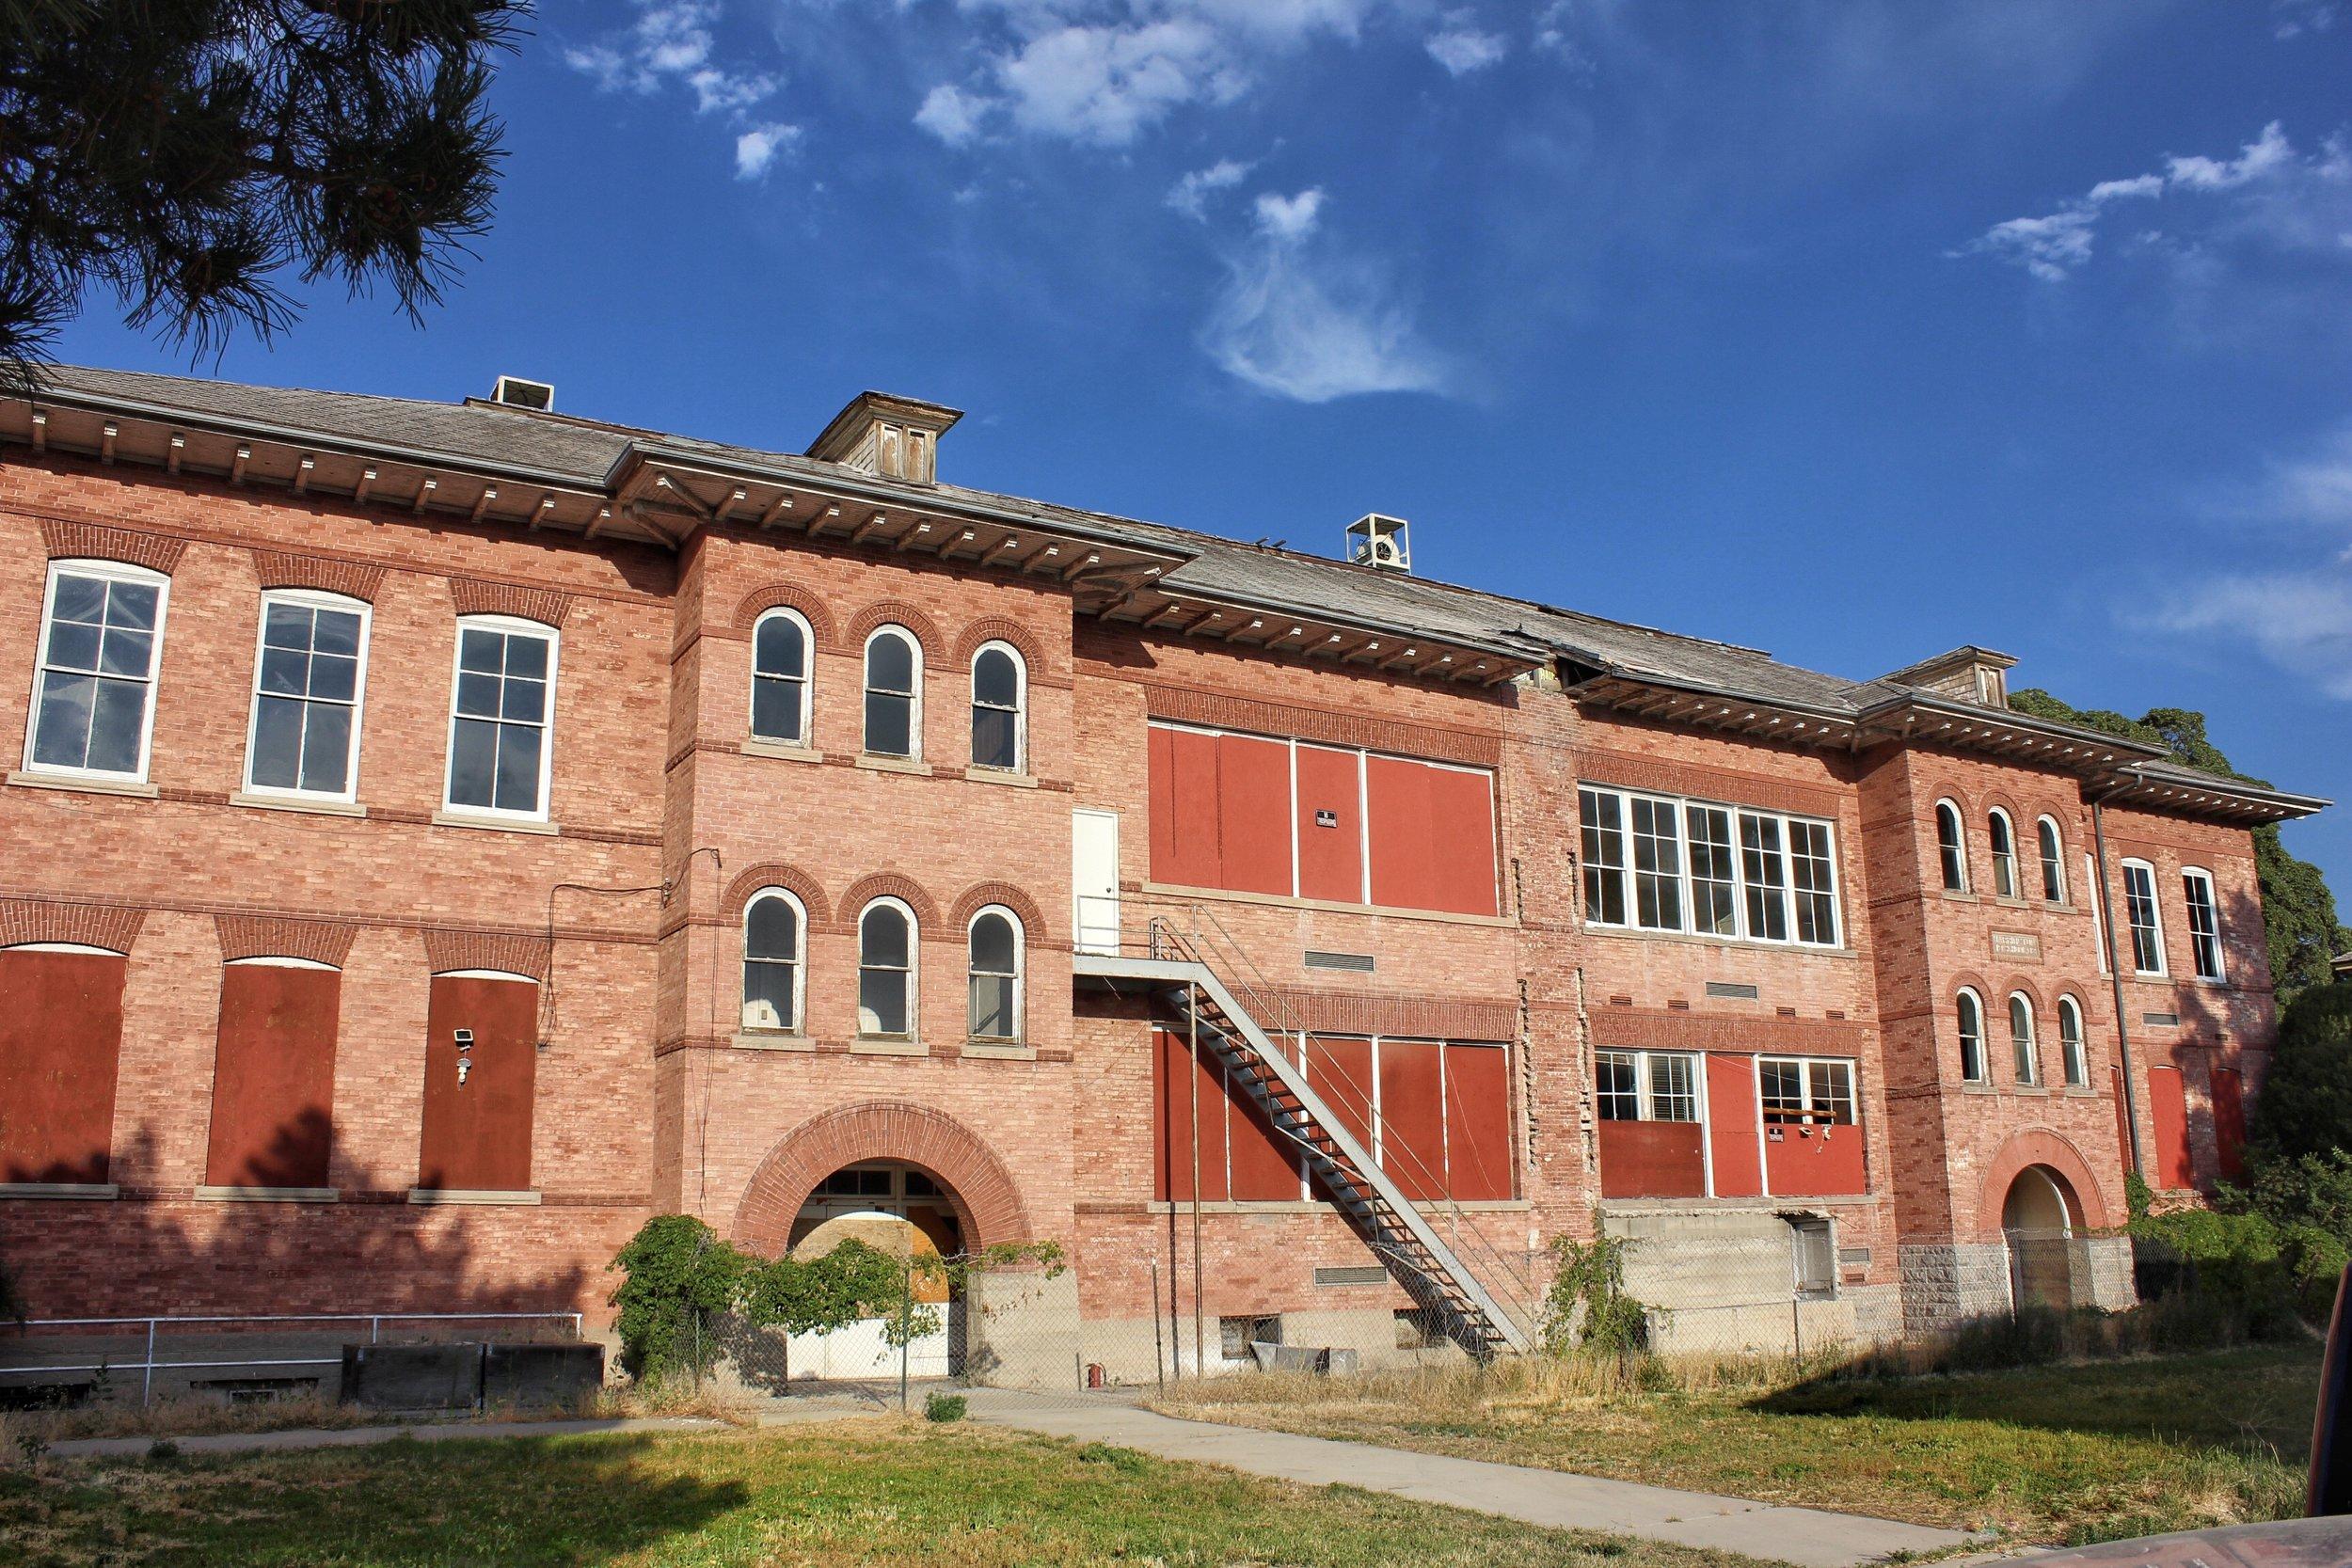 West Facing Harrington School